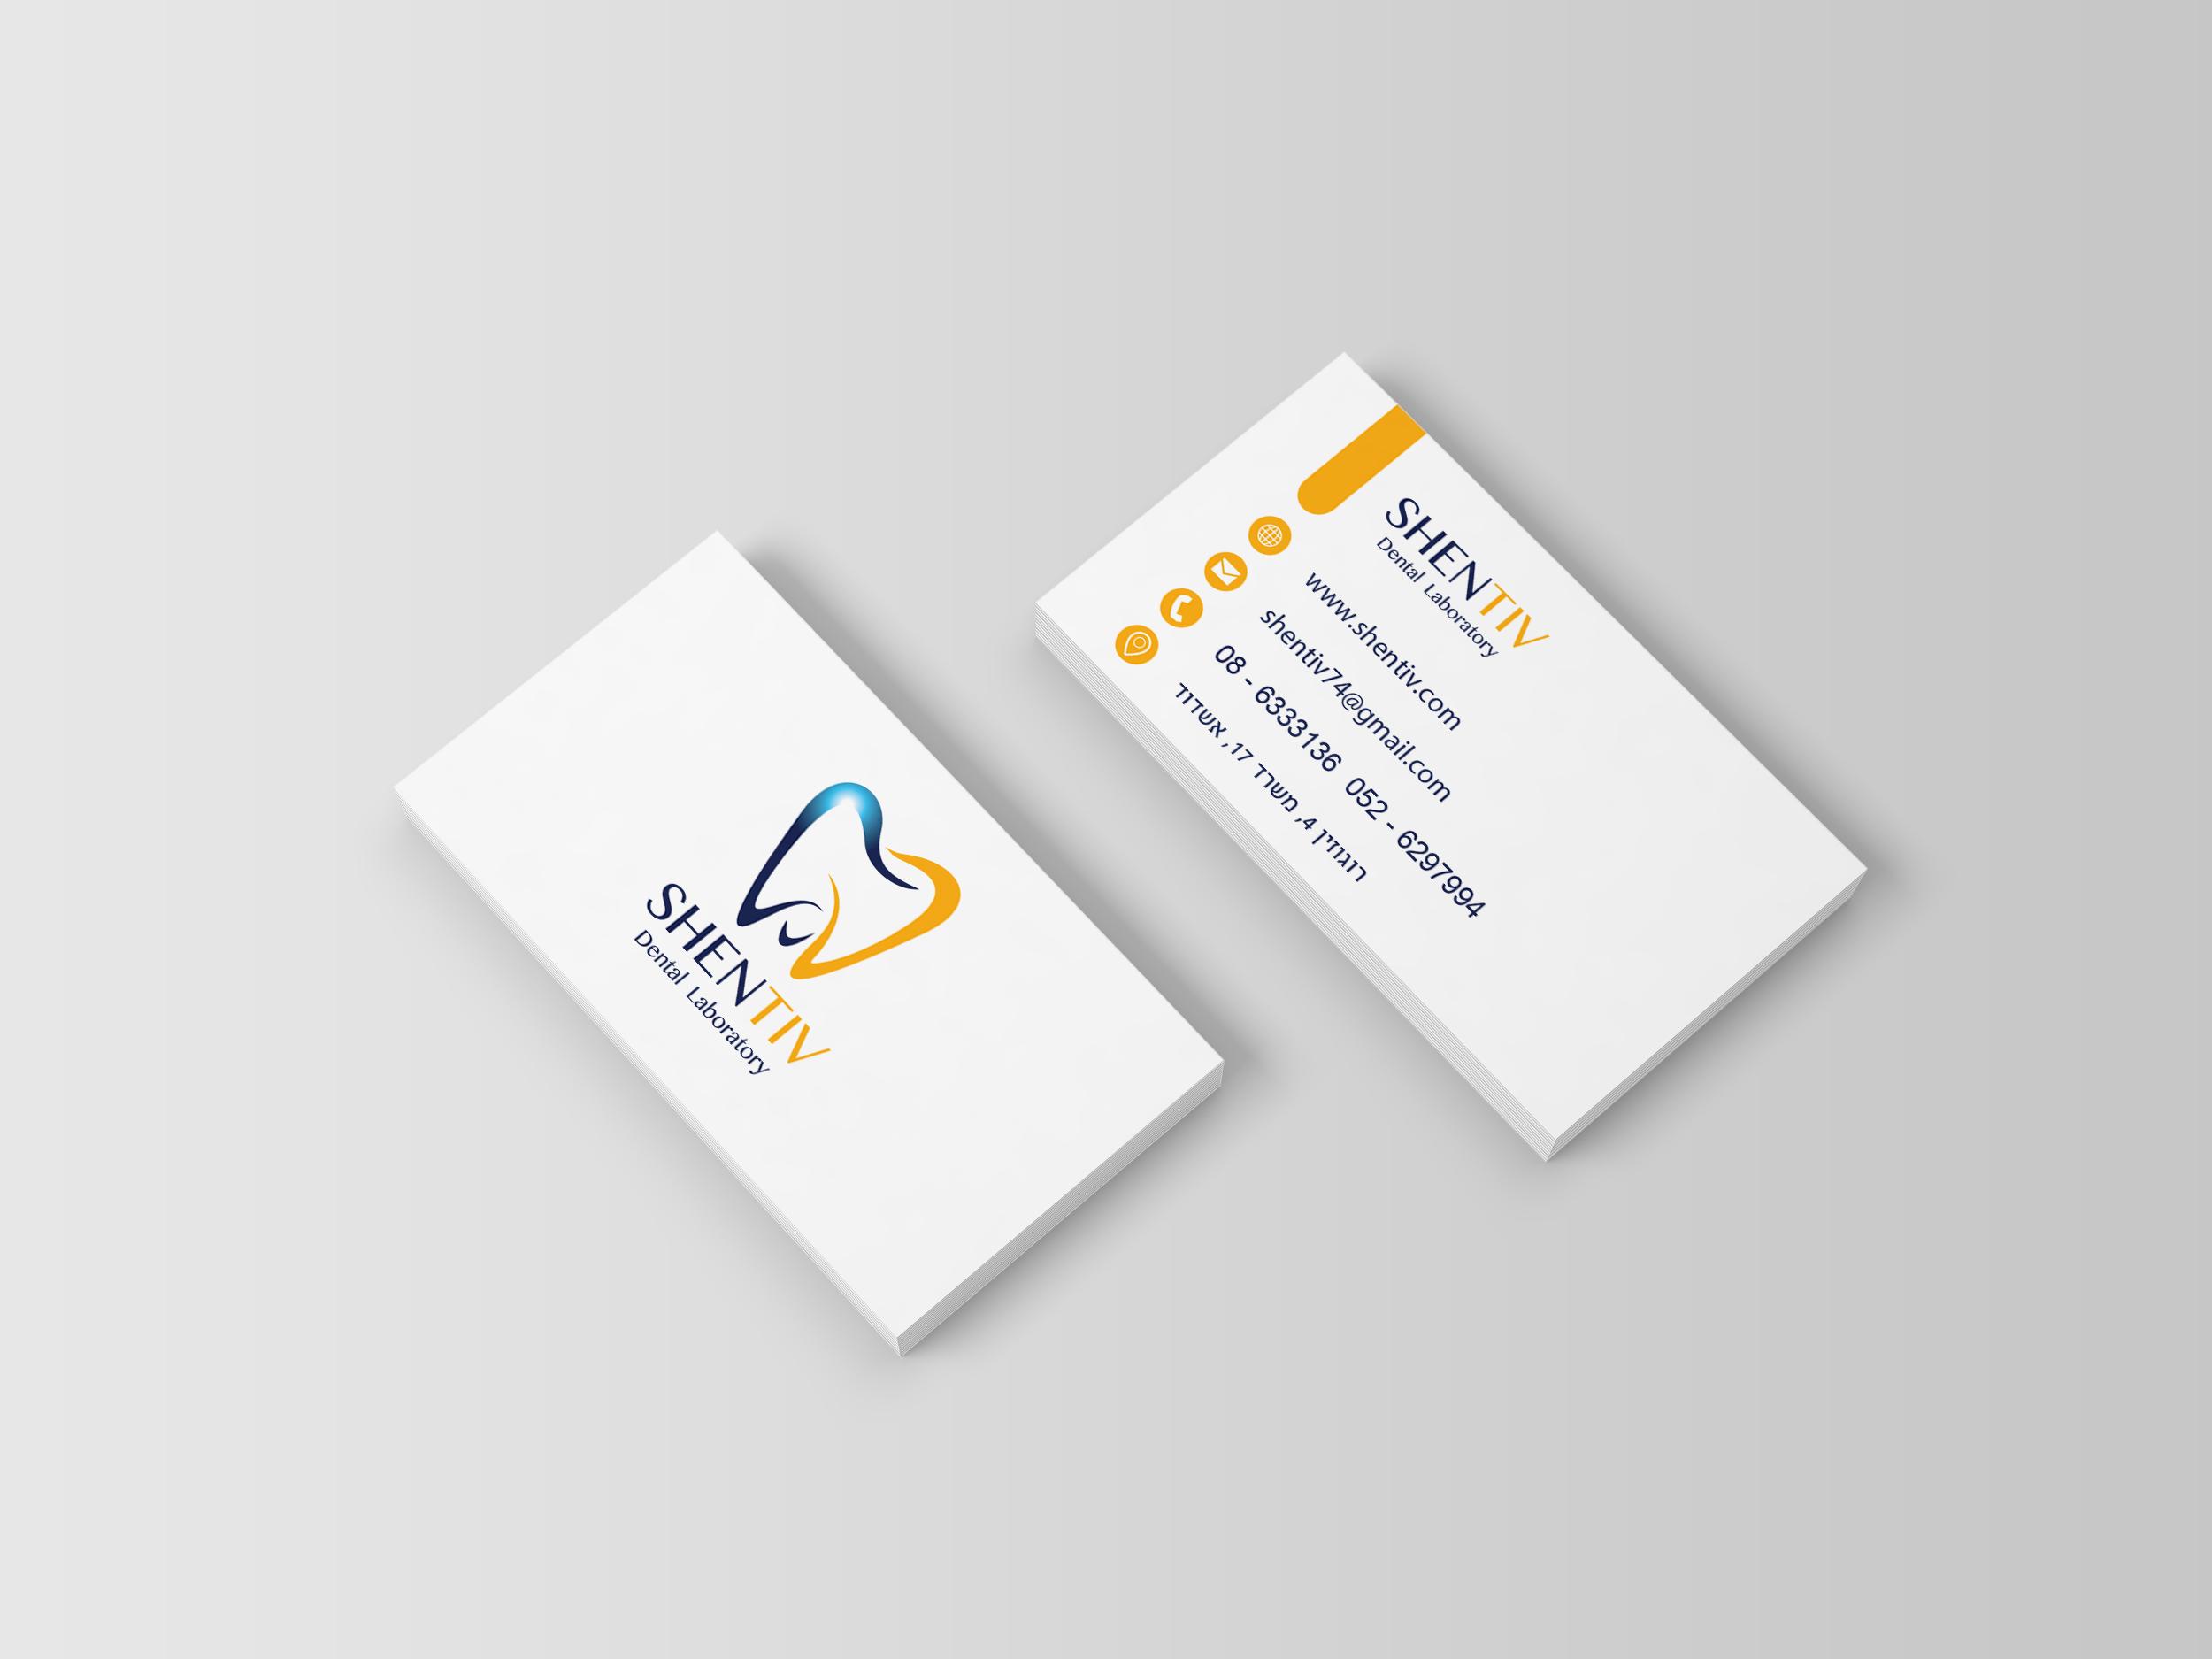 כרטיס ביקור מעוצב